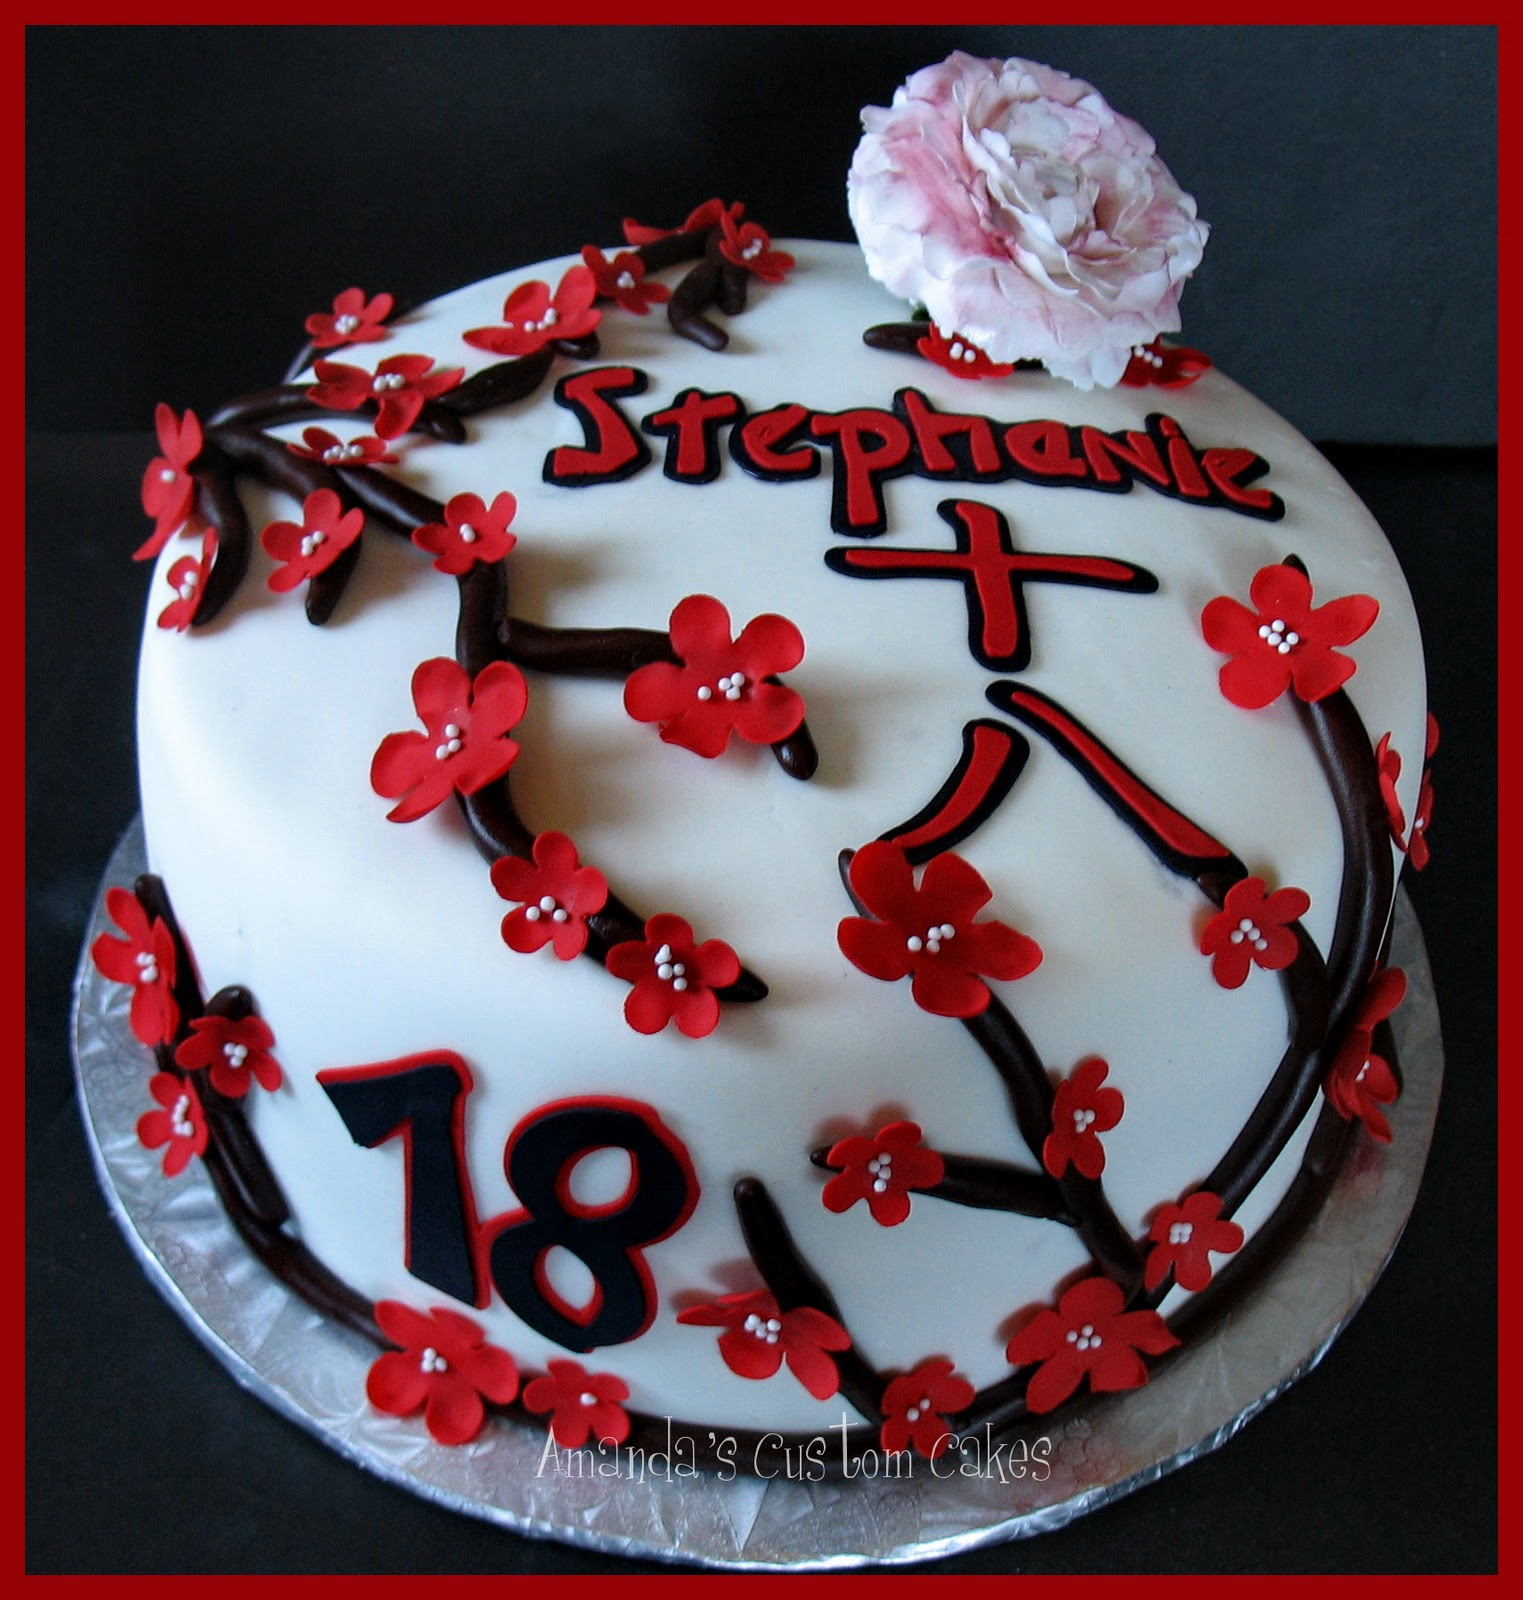 Birthday Cake: Amanda's Custom Cakes: Japanese Themed Birthday Cake